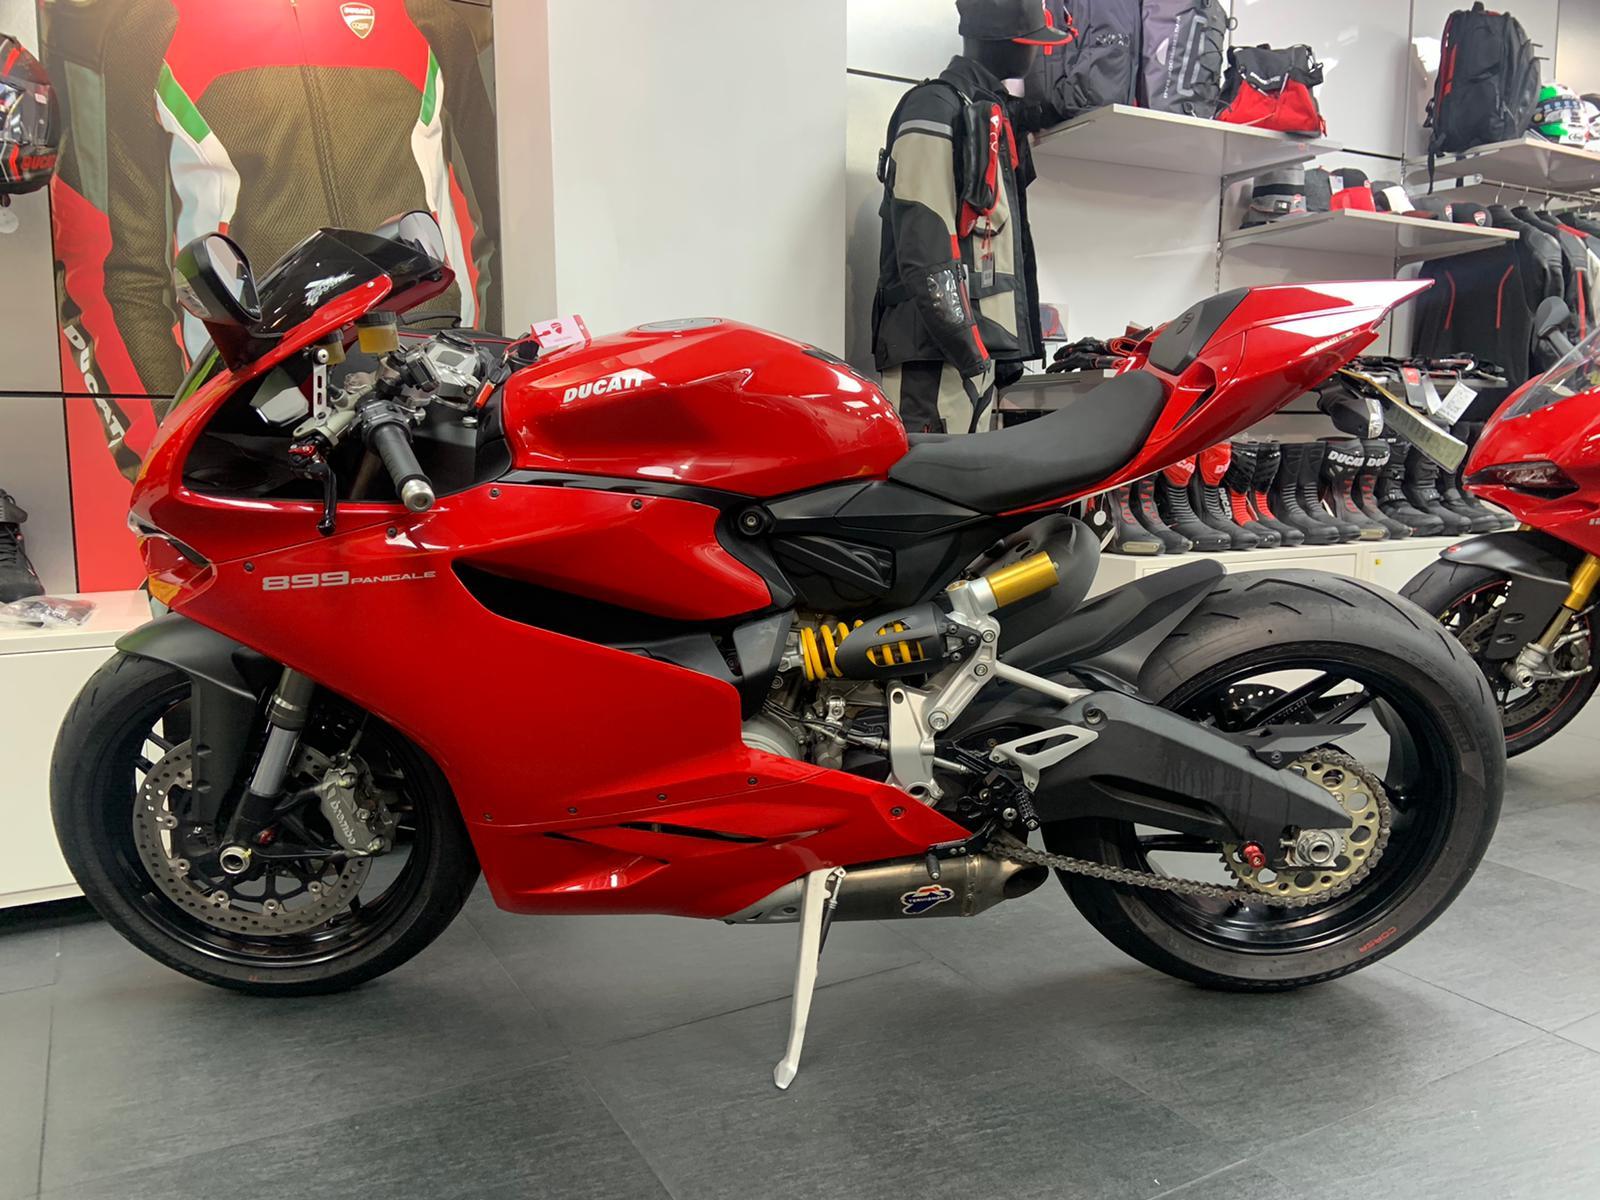 DUCATI 899Panigale 2014 紅色 - 「Webike摩托車市」